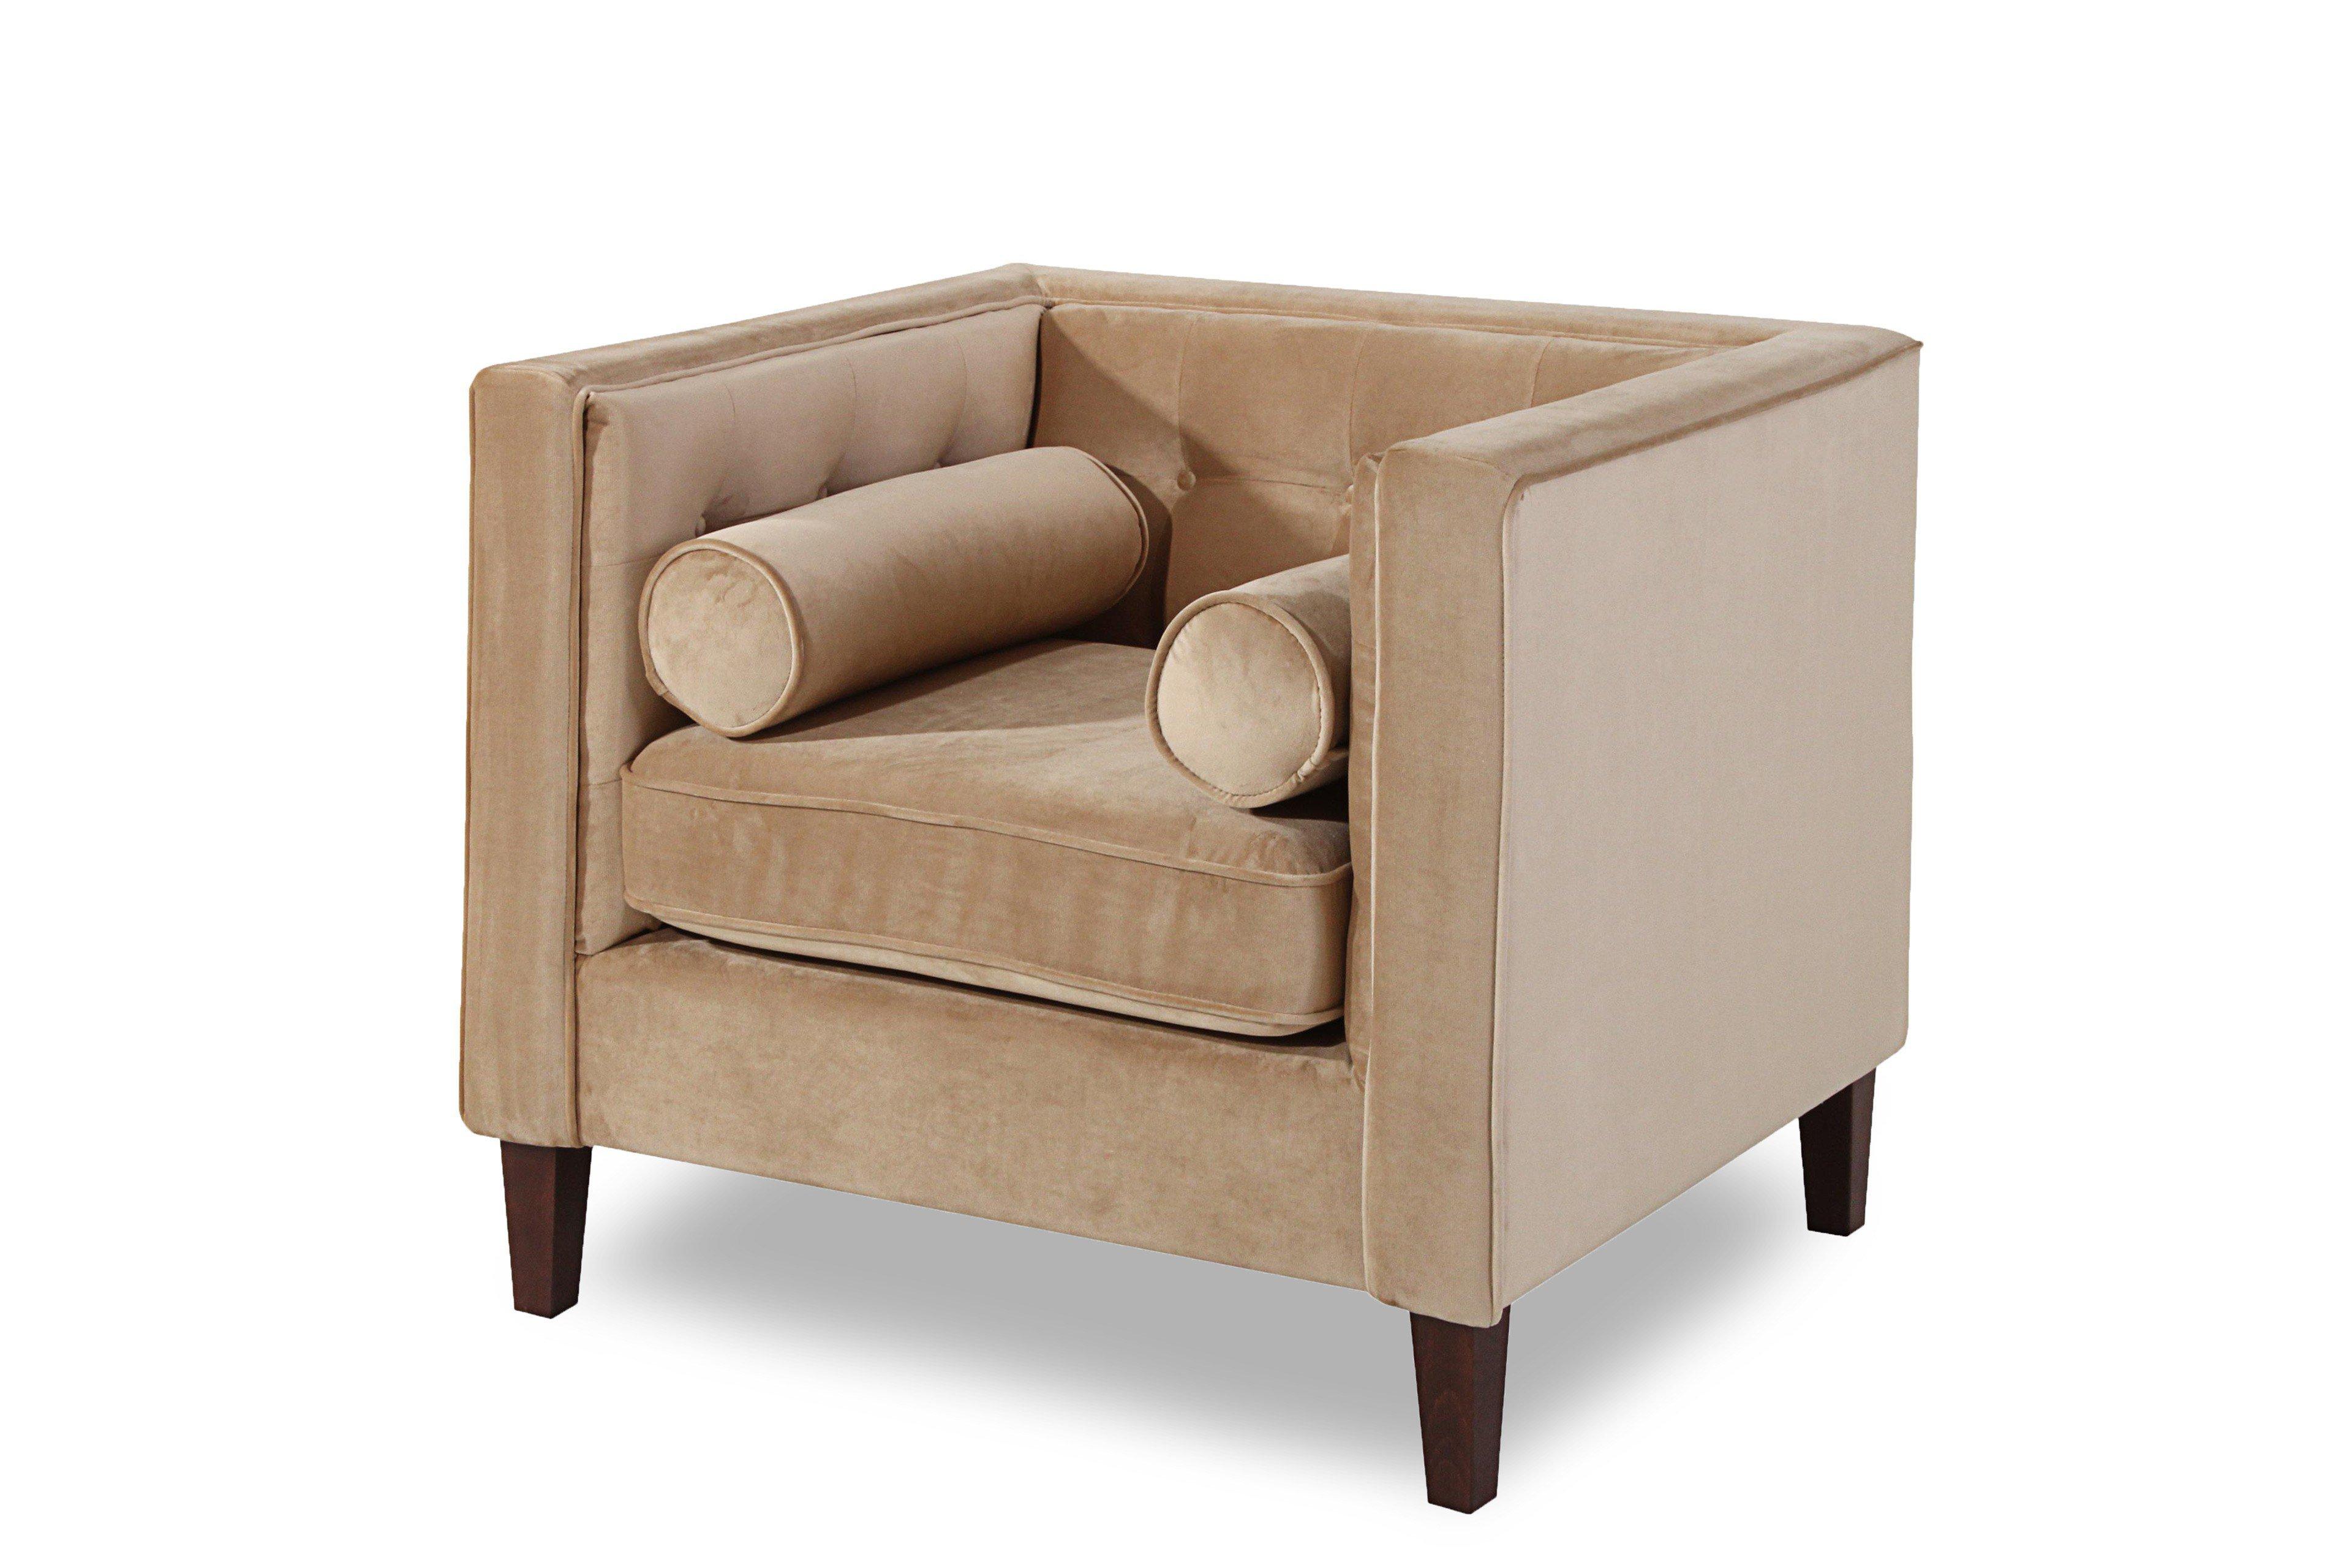 max winzer jeronimo sofa beige m bel letz ihr online shop. Black Bedroom Furniture Sets. Home Design Ideas